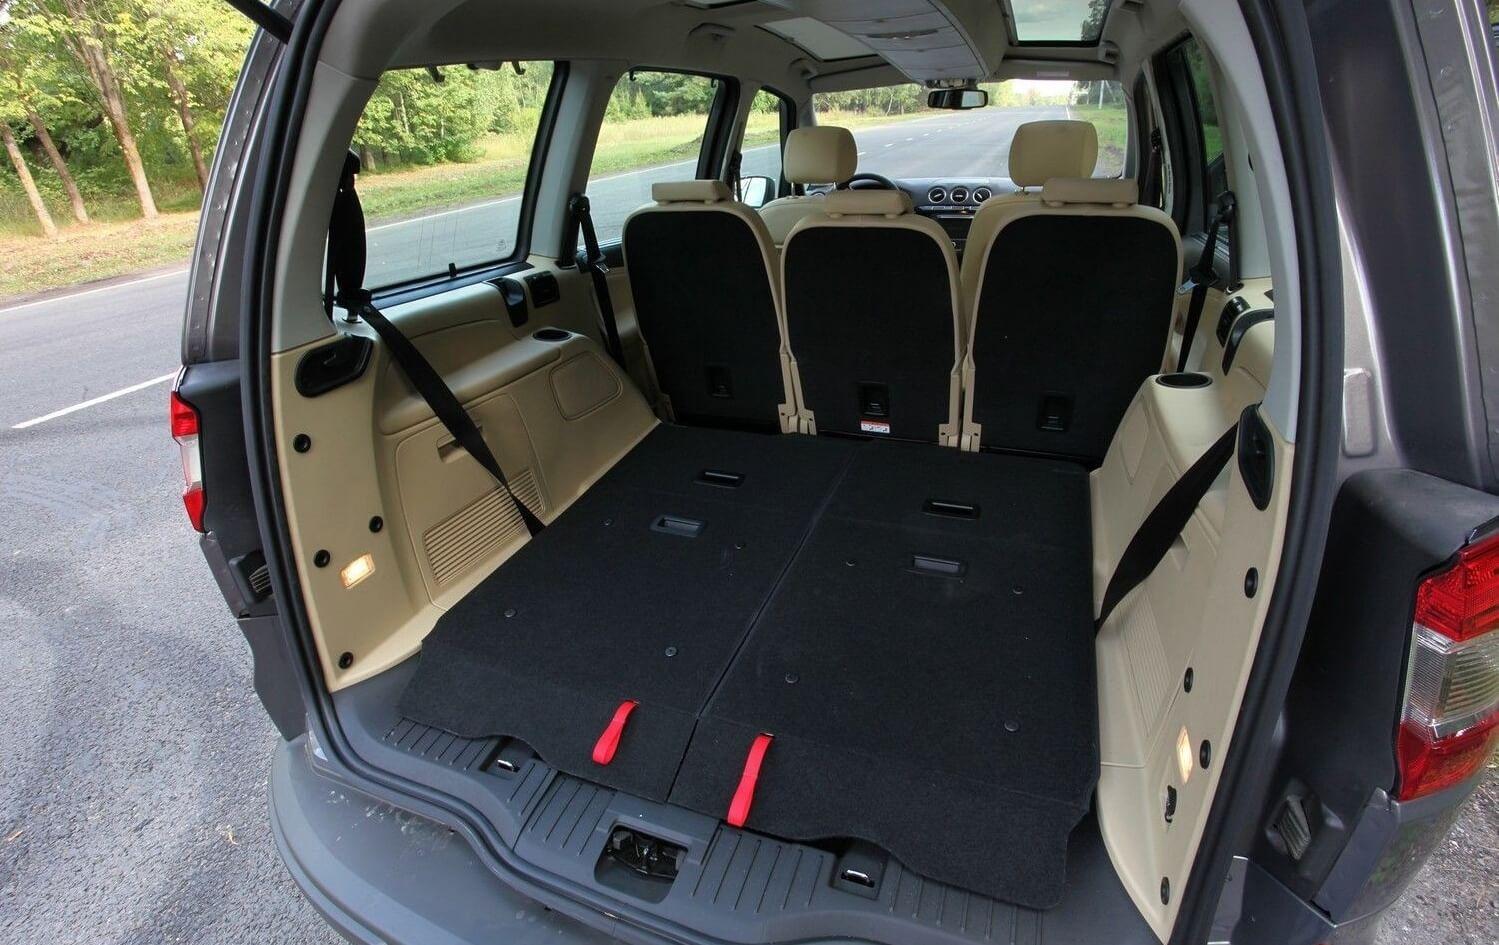 форд галакси объем багажника